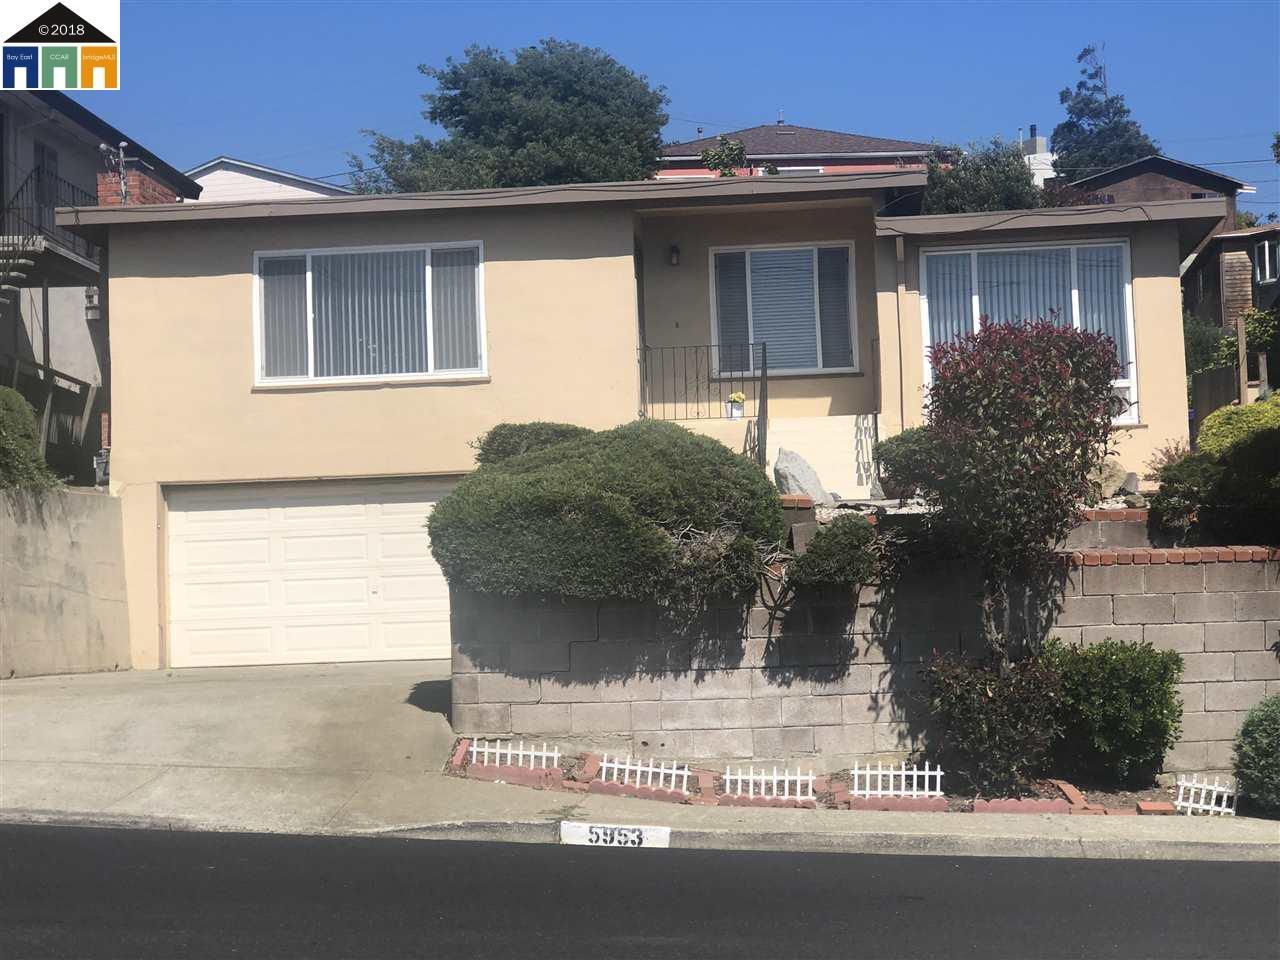 5953 ARLINGTON BLVD, RICHMOND, CA 94805